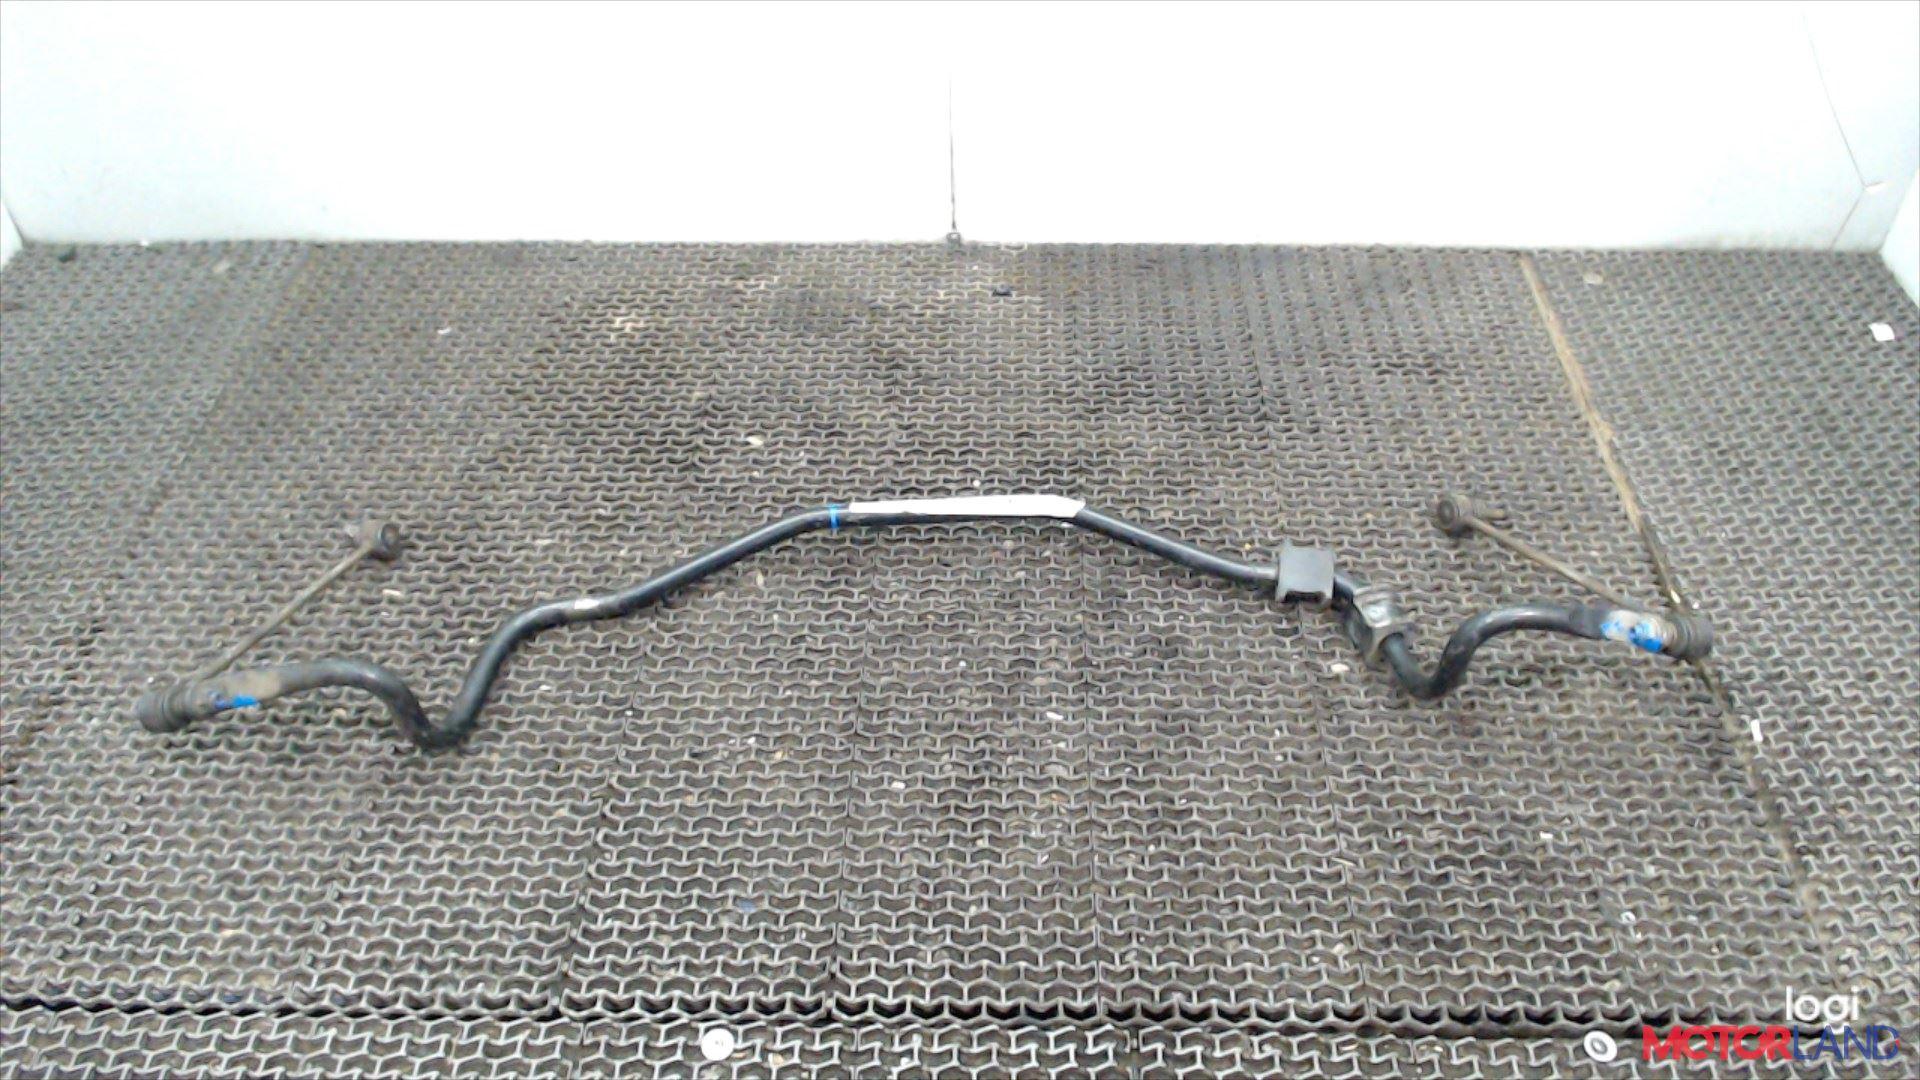 Стабилизатор подвески (поперечной устойчивости) [AdditionalType] Acura MDX 2007-2013, [КонстрНомер-Артикул] #1